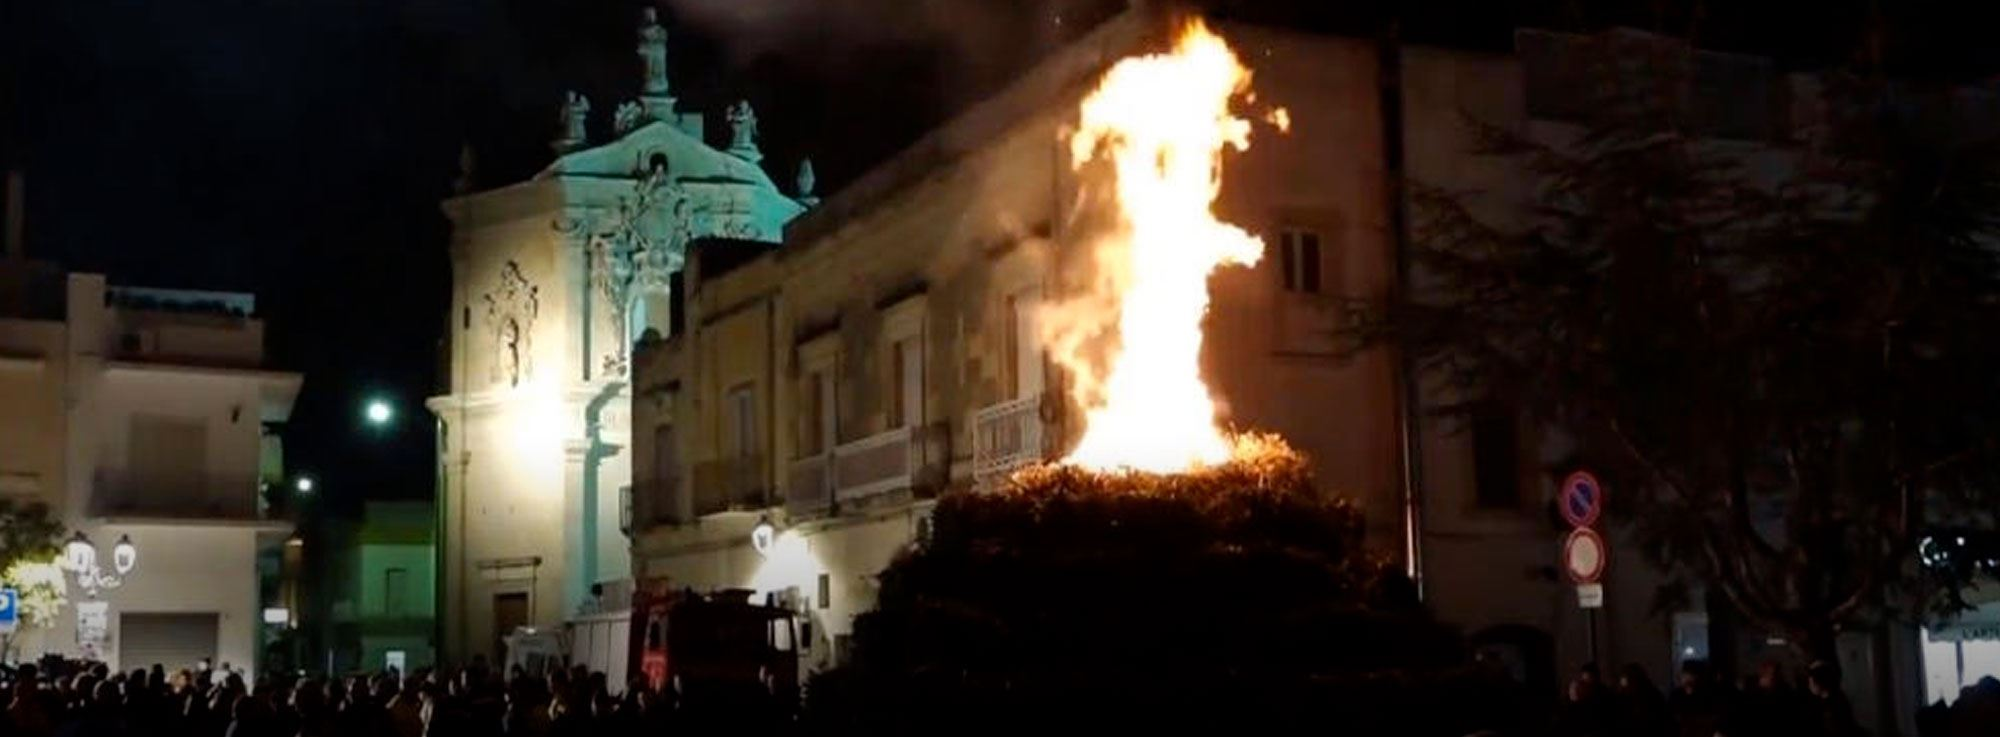 Cutrofiano: Sant'Antoni de le Fòcare